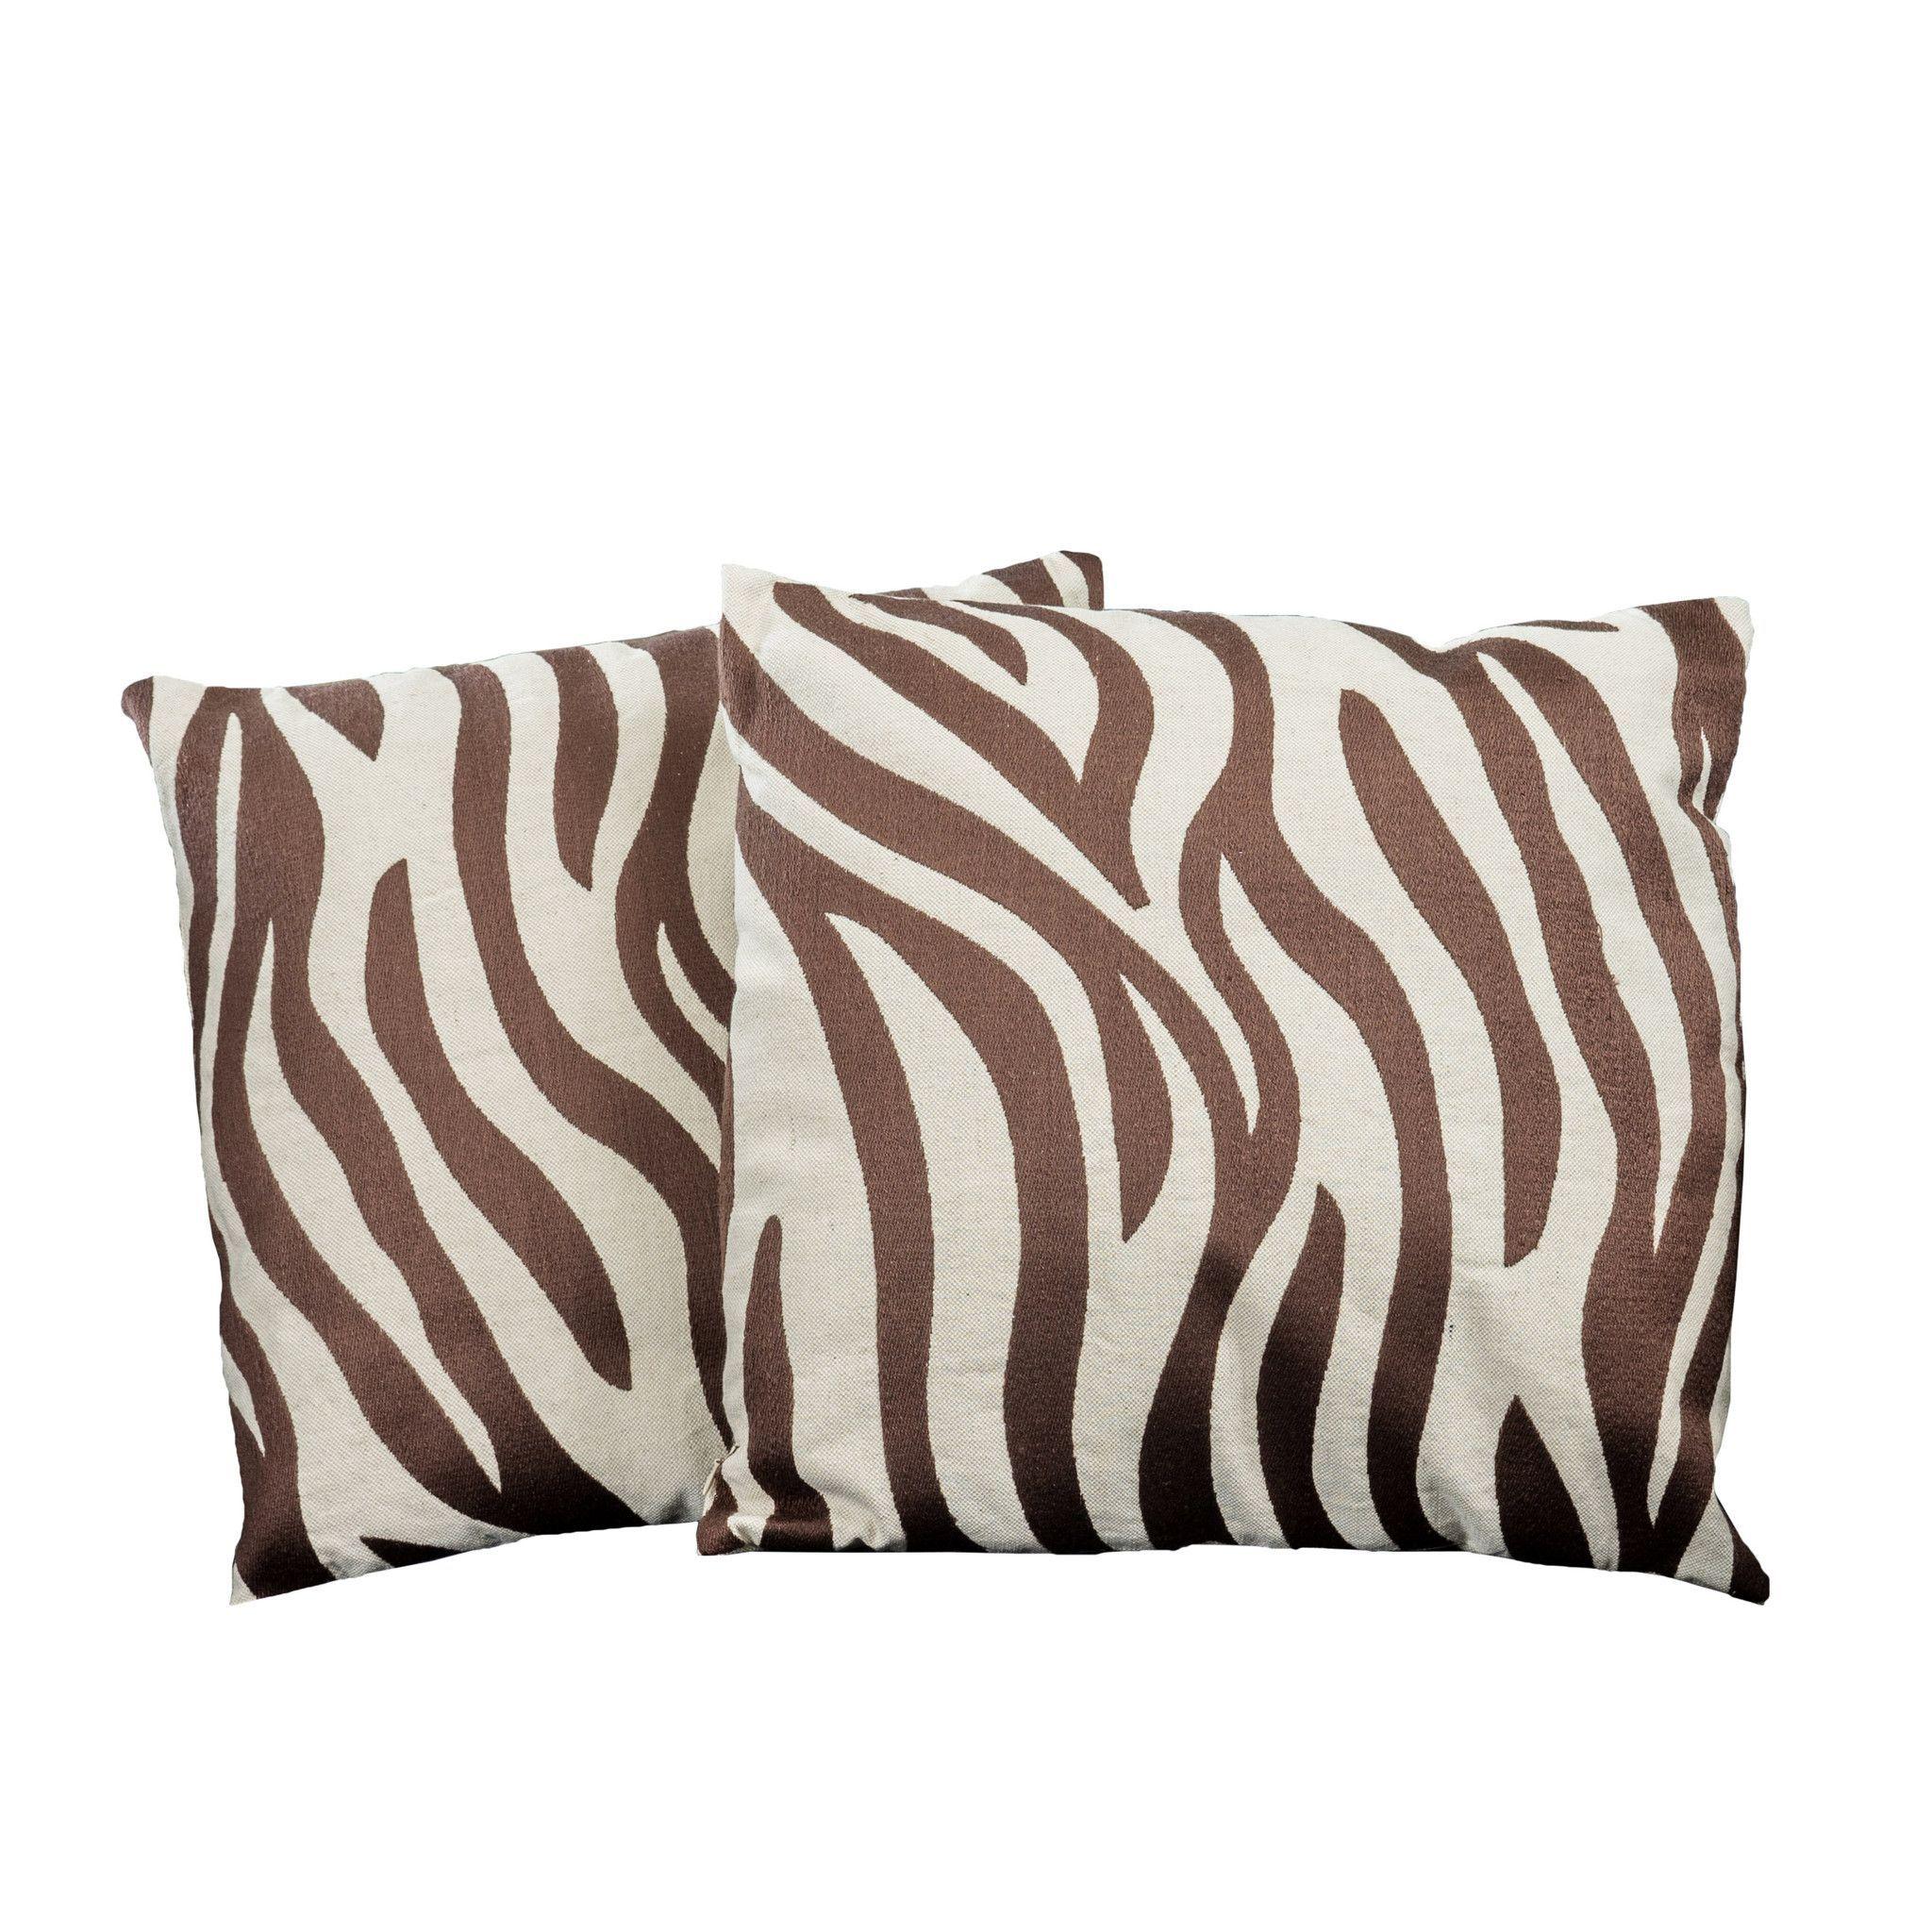 Fantastic 18 Brown Zebra Print Decorative Throw Pillows Set Of 2 Uwap Interior Chair Design Uwaporg